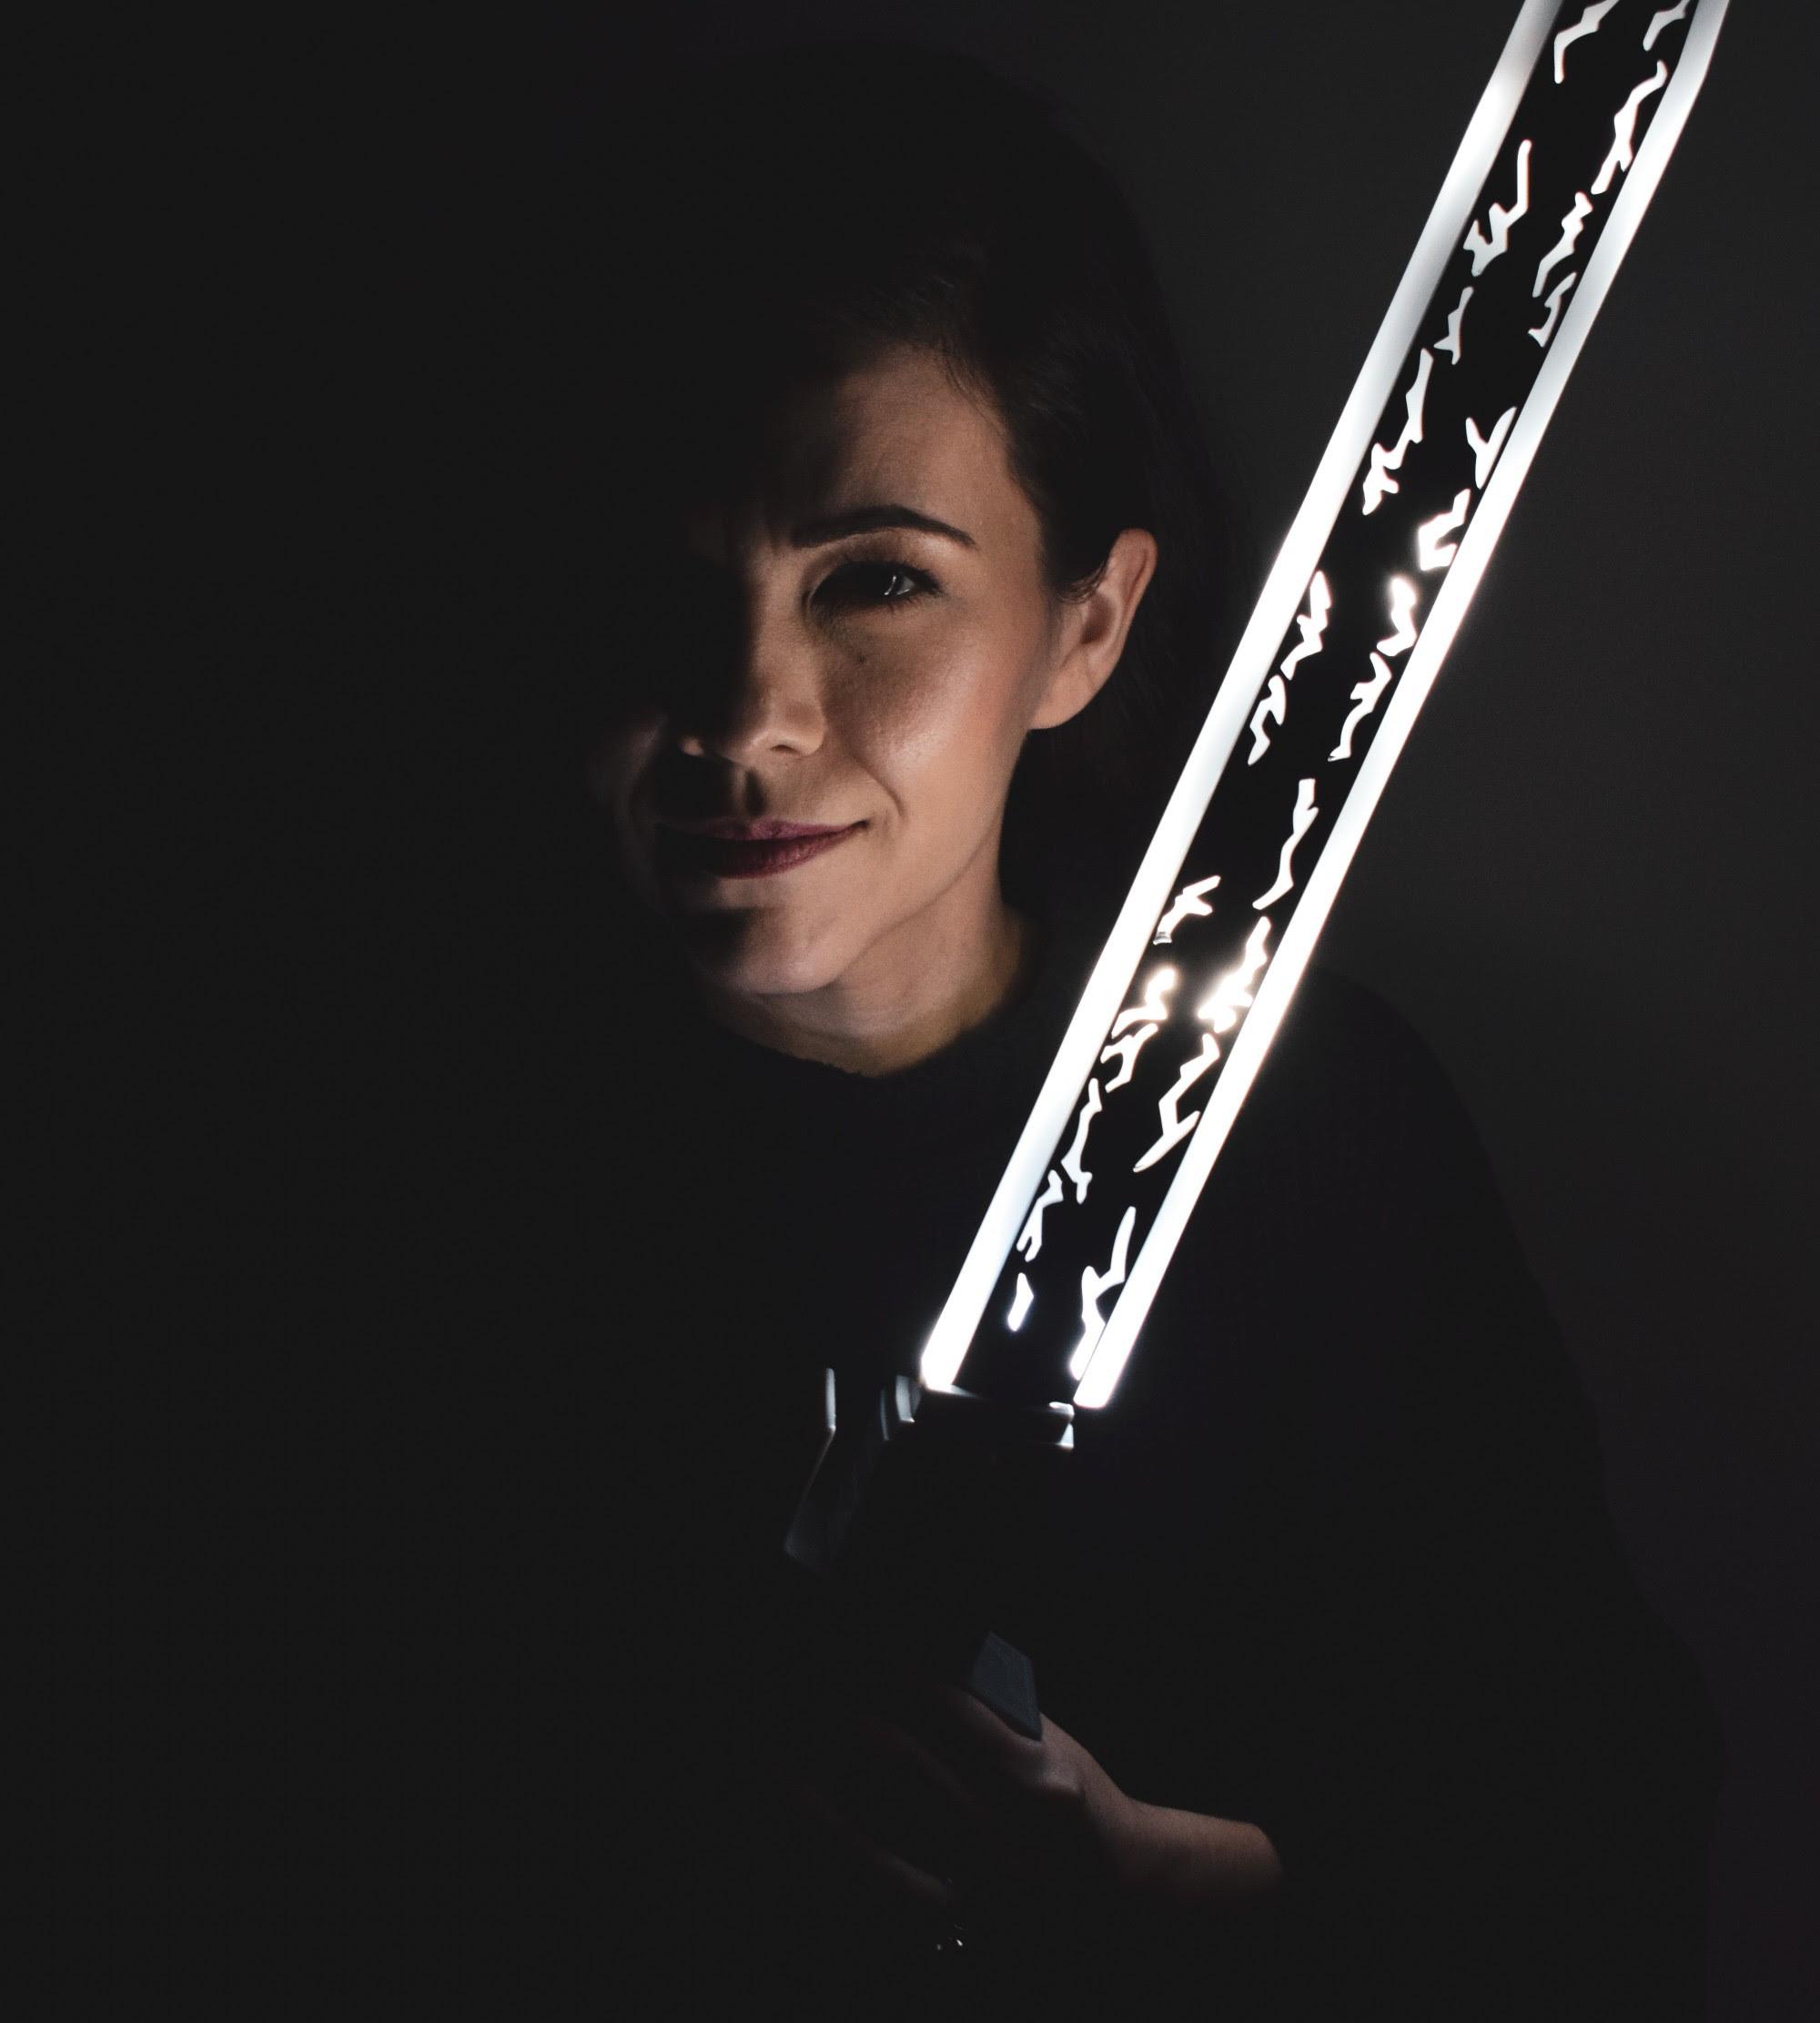 Star Wars: Galaxy's Edge - New Darksaber, Plushies, Boba Fett Jetpack & More!| Anakin and His Angel